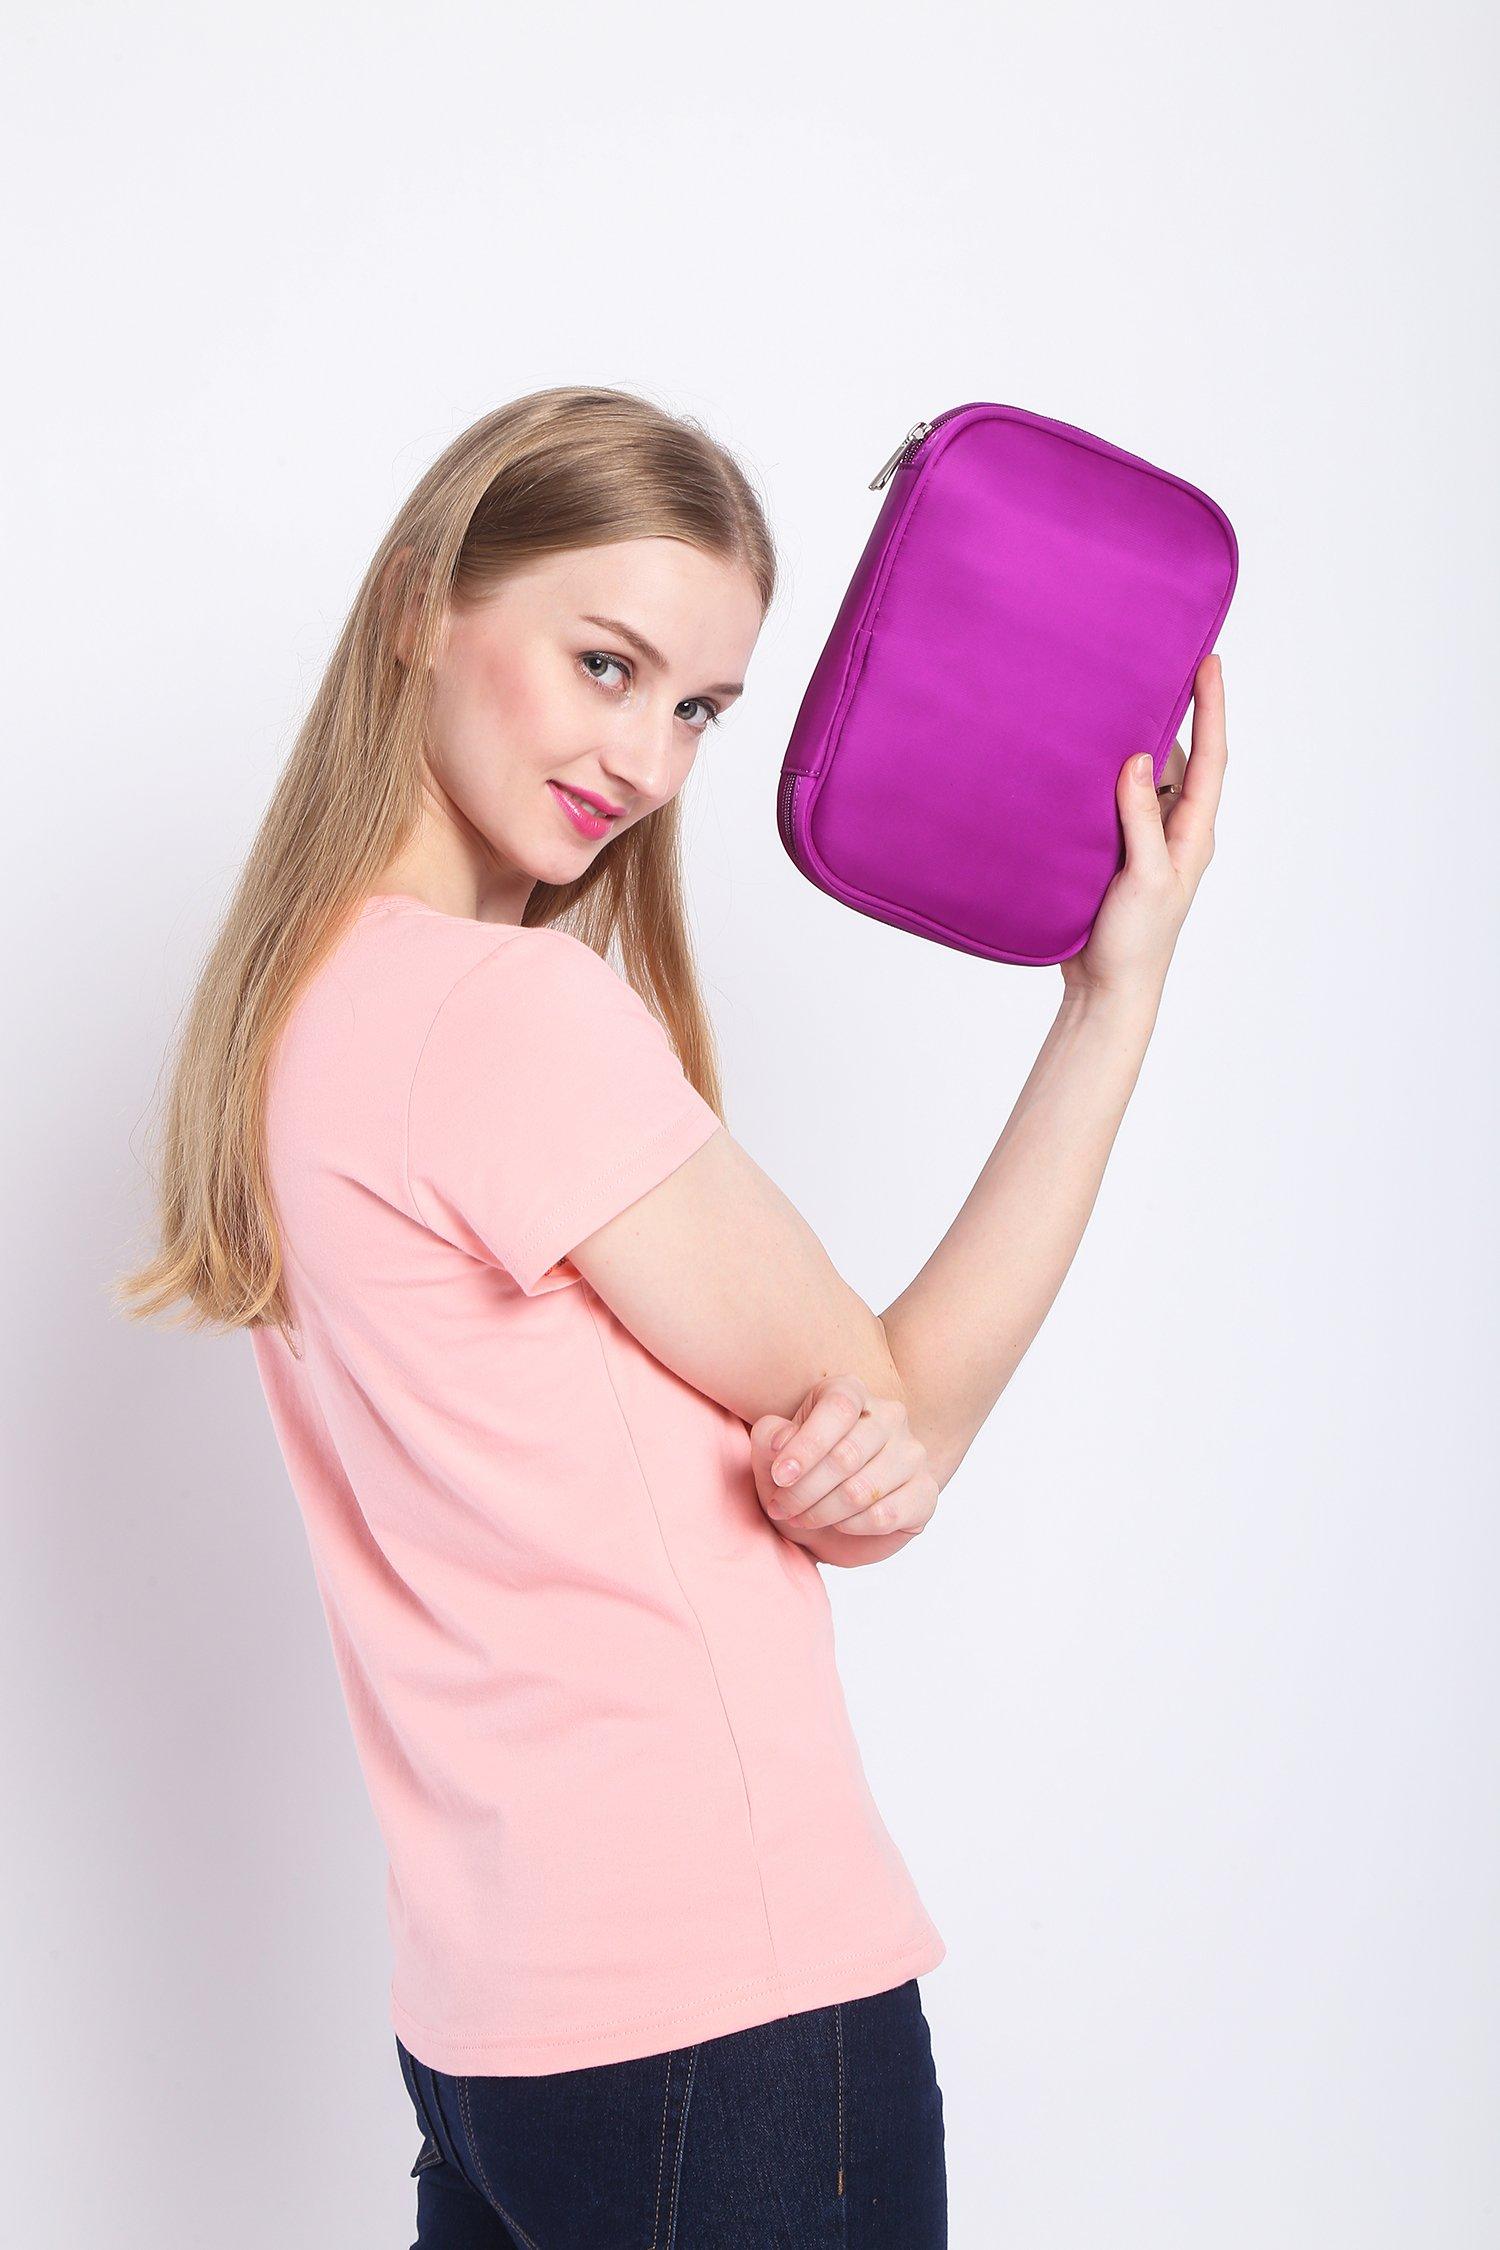 Lily & Drew Travel Jewelry Storage Carrying Case Jewelry Organizer with Removable Pouch (V1 Dark Purple) by Lily & Drew (Image #2)